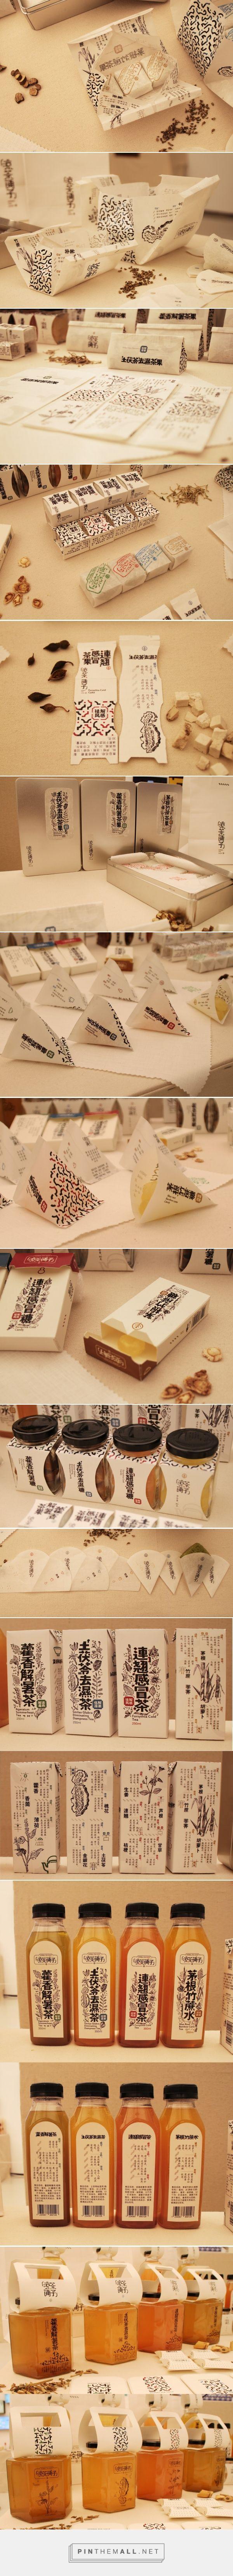 The Herbal Tea Shop packaging design by Sumin Woo - https://www.packagingoftheworld.com/2018/02/the-herbal-tea-shop.html